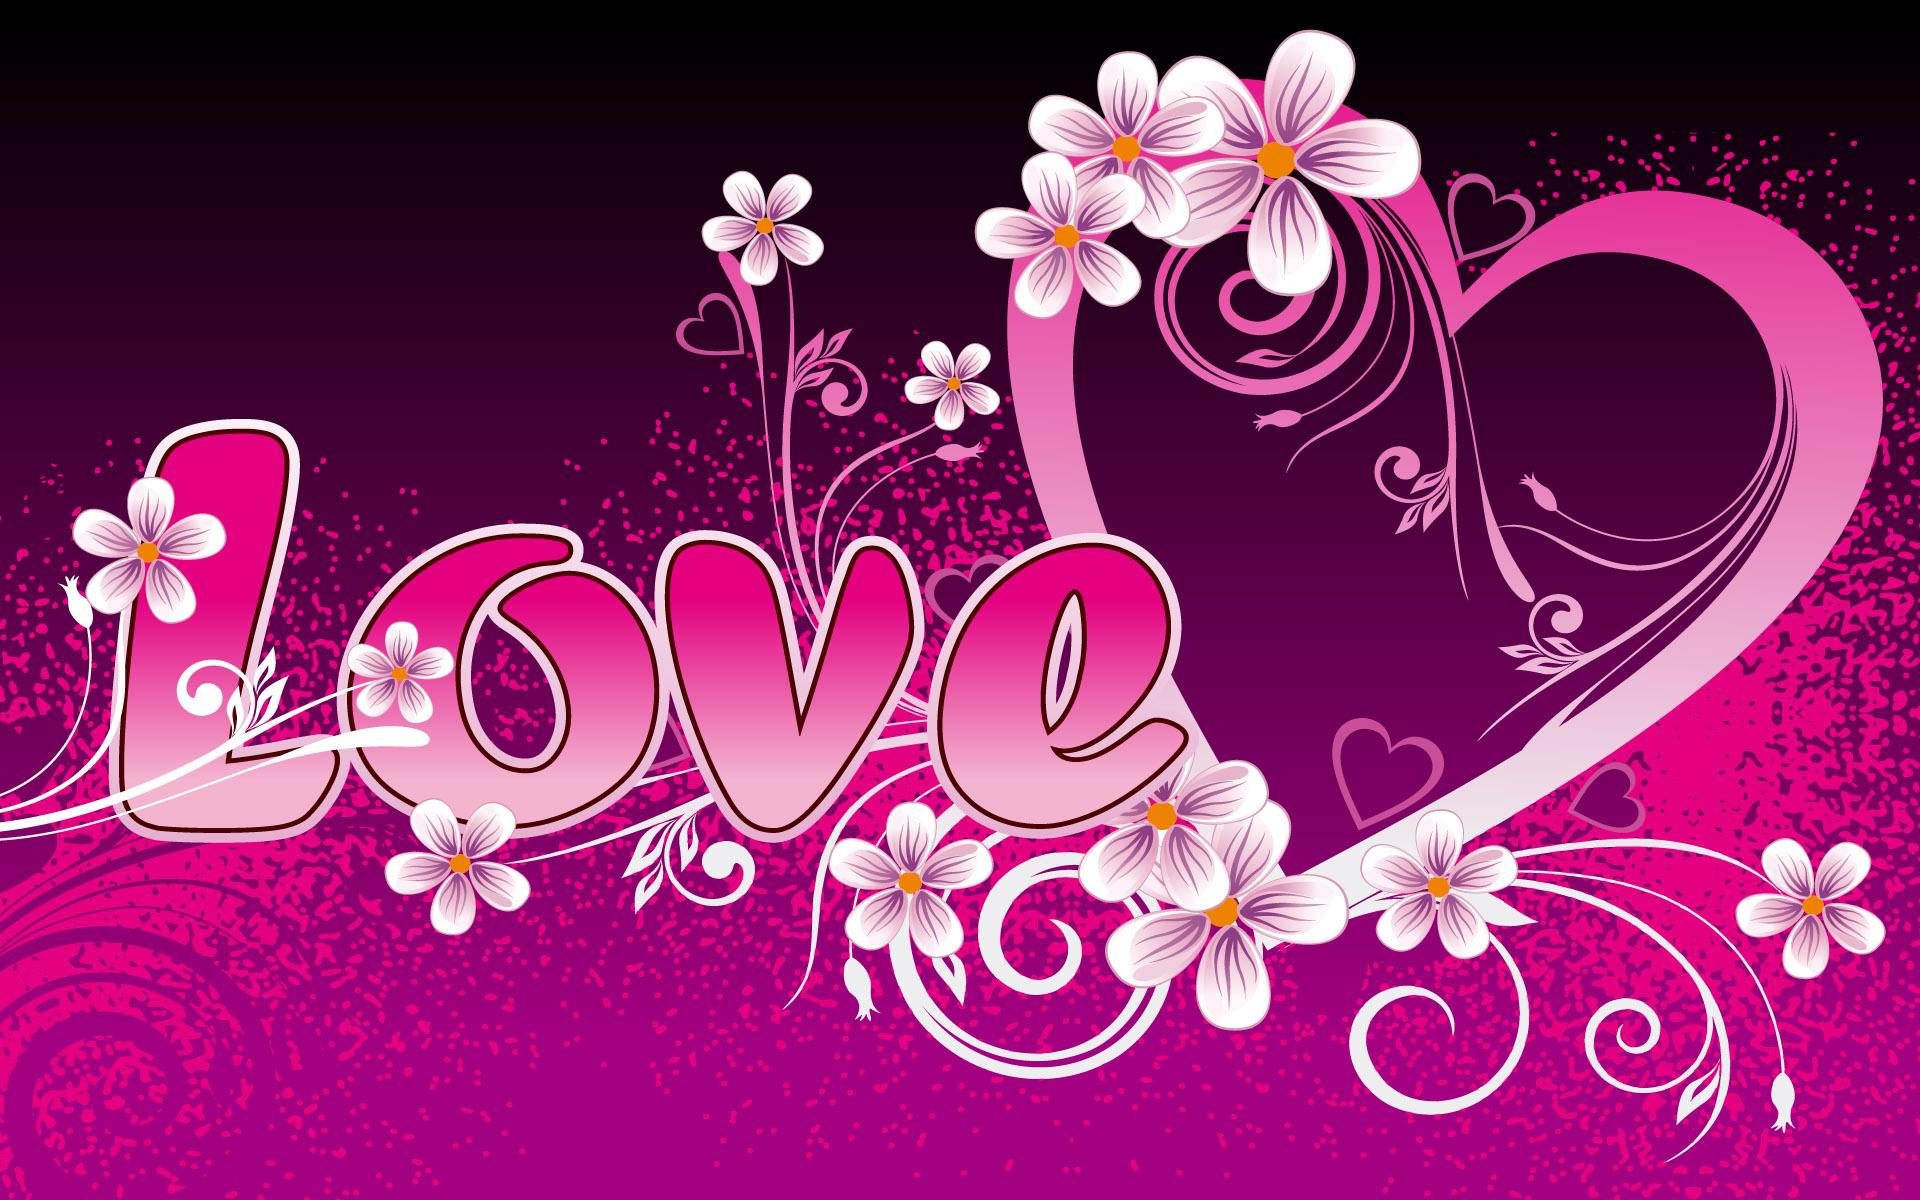 Love Heart Wallpapers   HD Wallpapers 90608 1920x1200